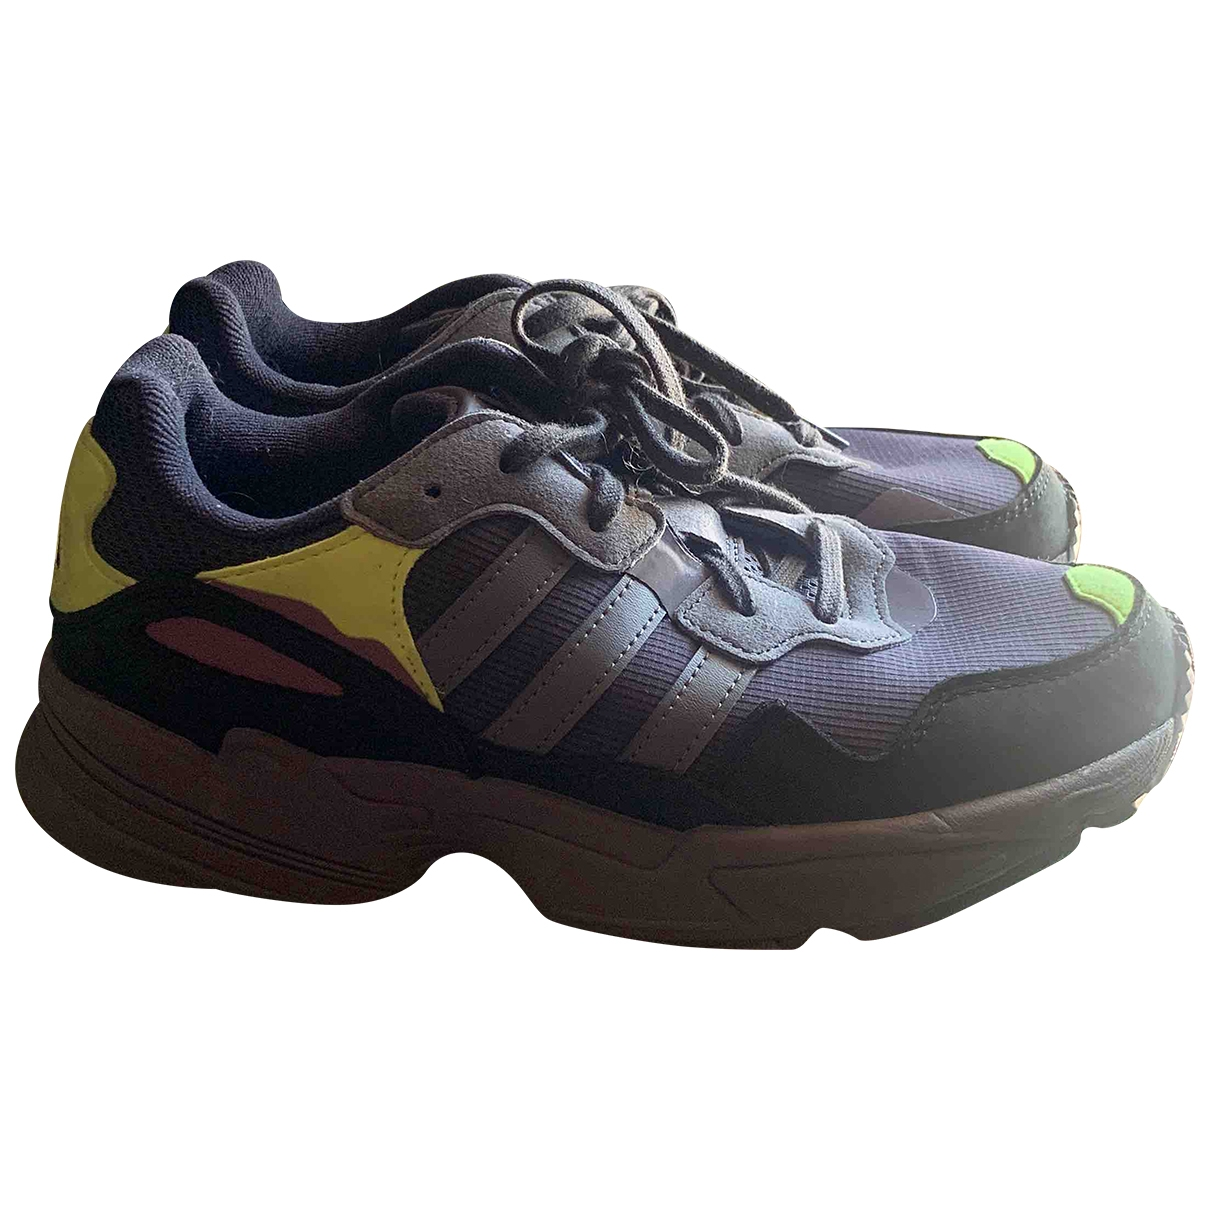 Adidas \N Grey Cloth Trainers for Women 5.5 UK